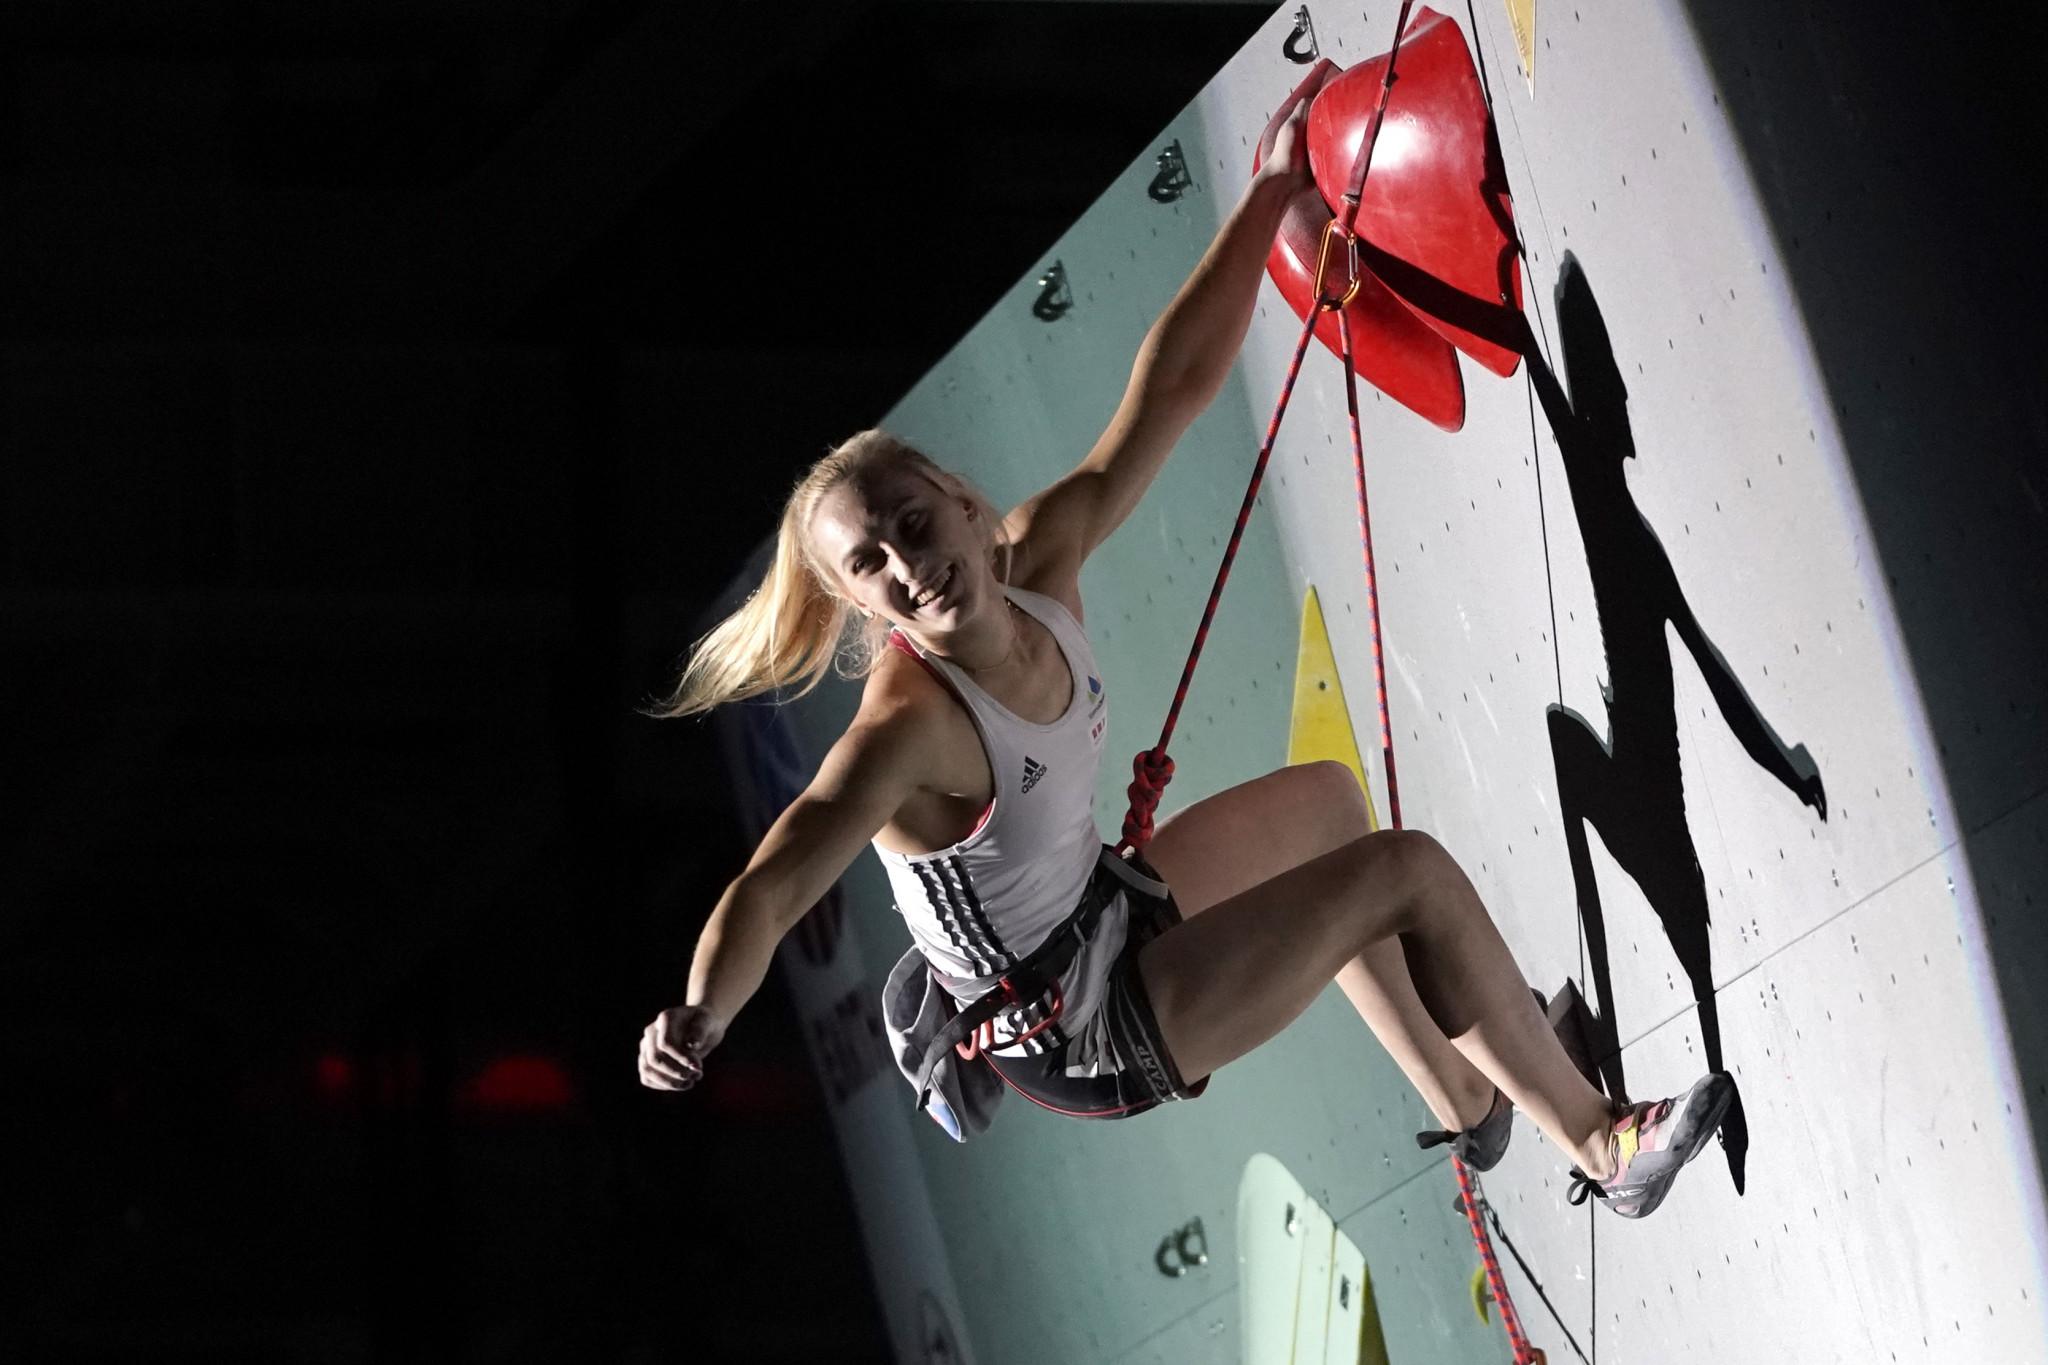 Sport climbing will make its European Games debut at Kraków-Małopolska 2023 ©Getty Images